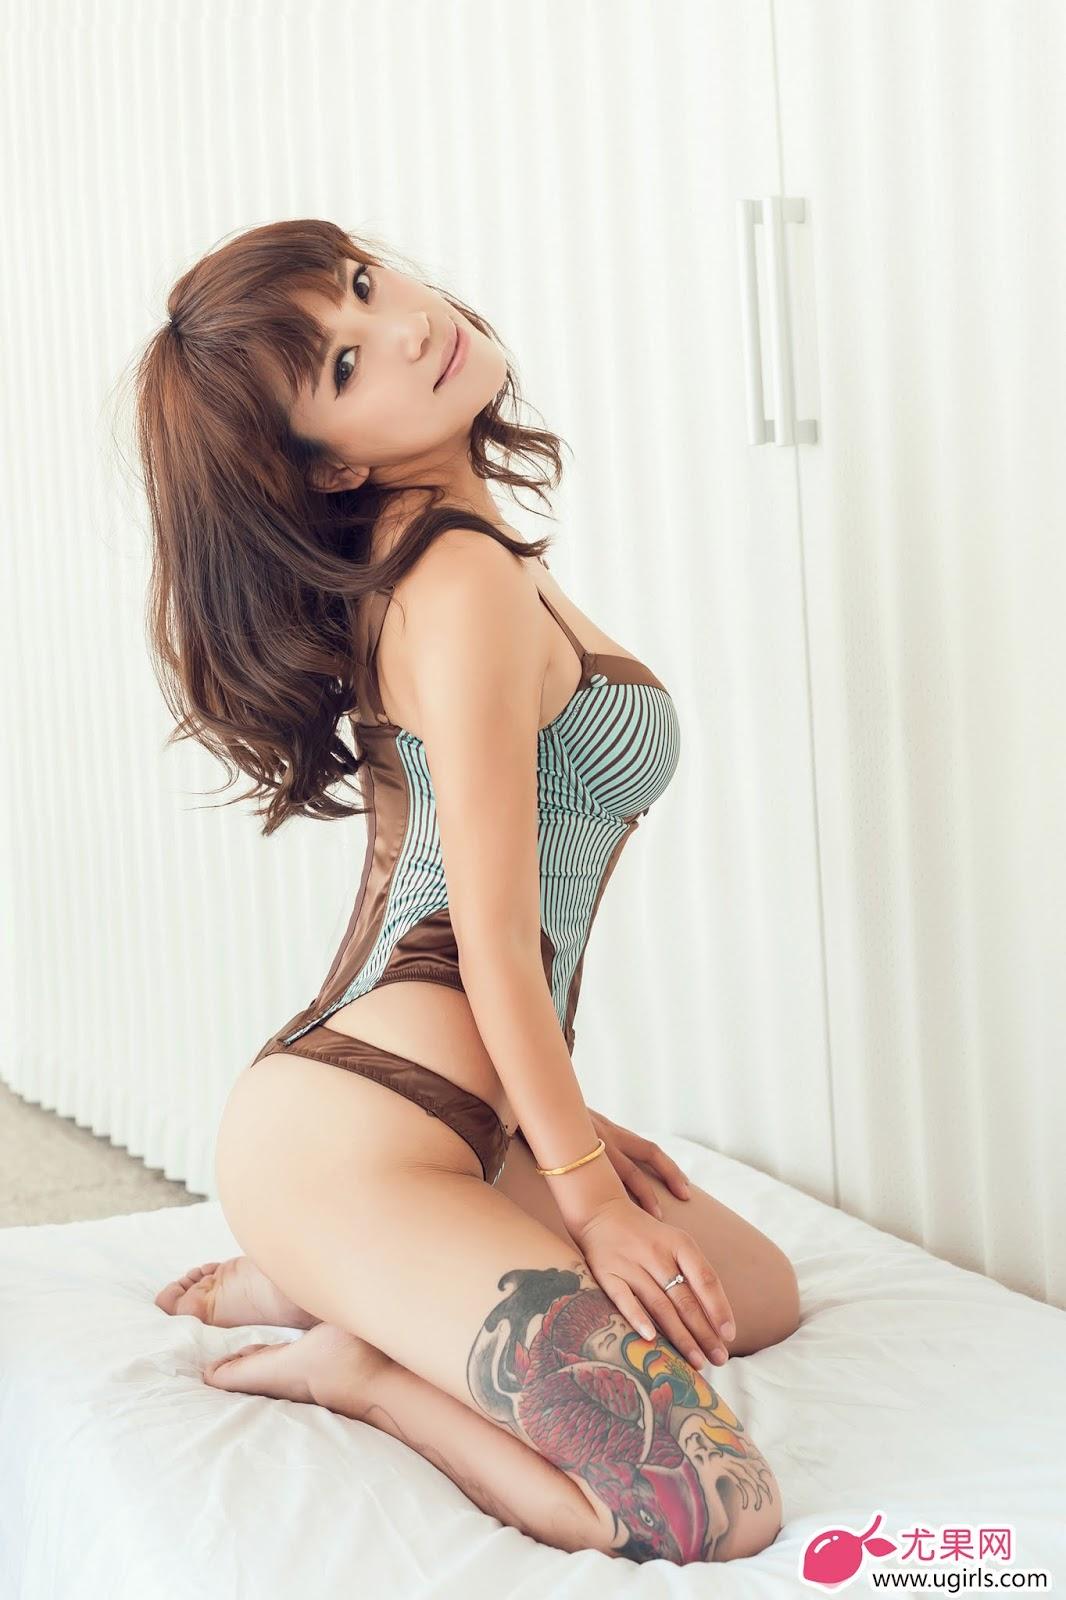 DLS 0234 - Hot Girl Ugirls No.021 Model: 田依依